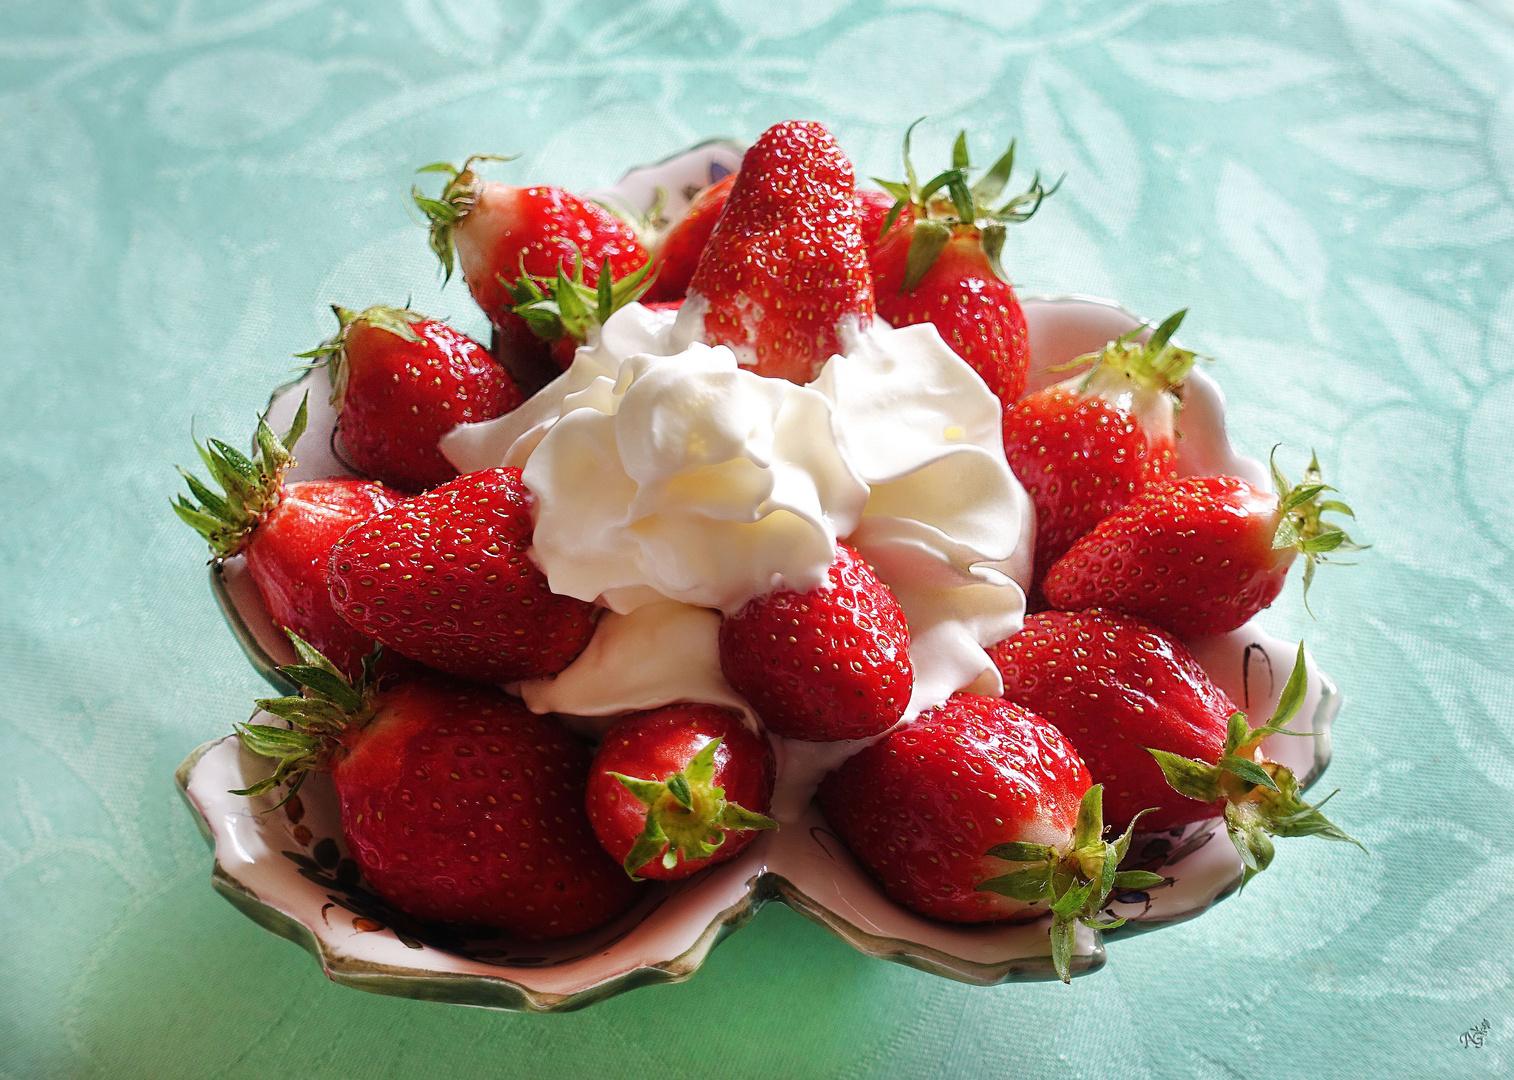 cest-lheure-du-gouter-fraises-chantilly-6bf55df0-0aa8-4d14-a423-c414e7466616